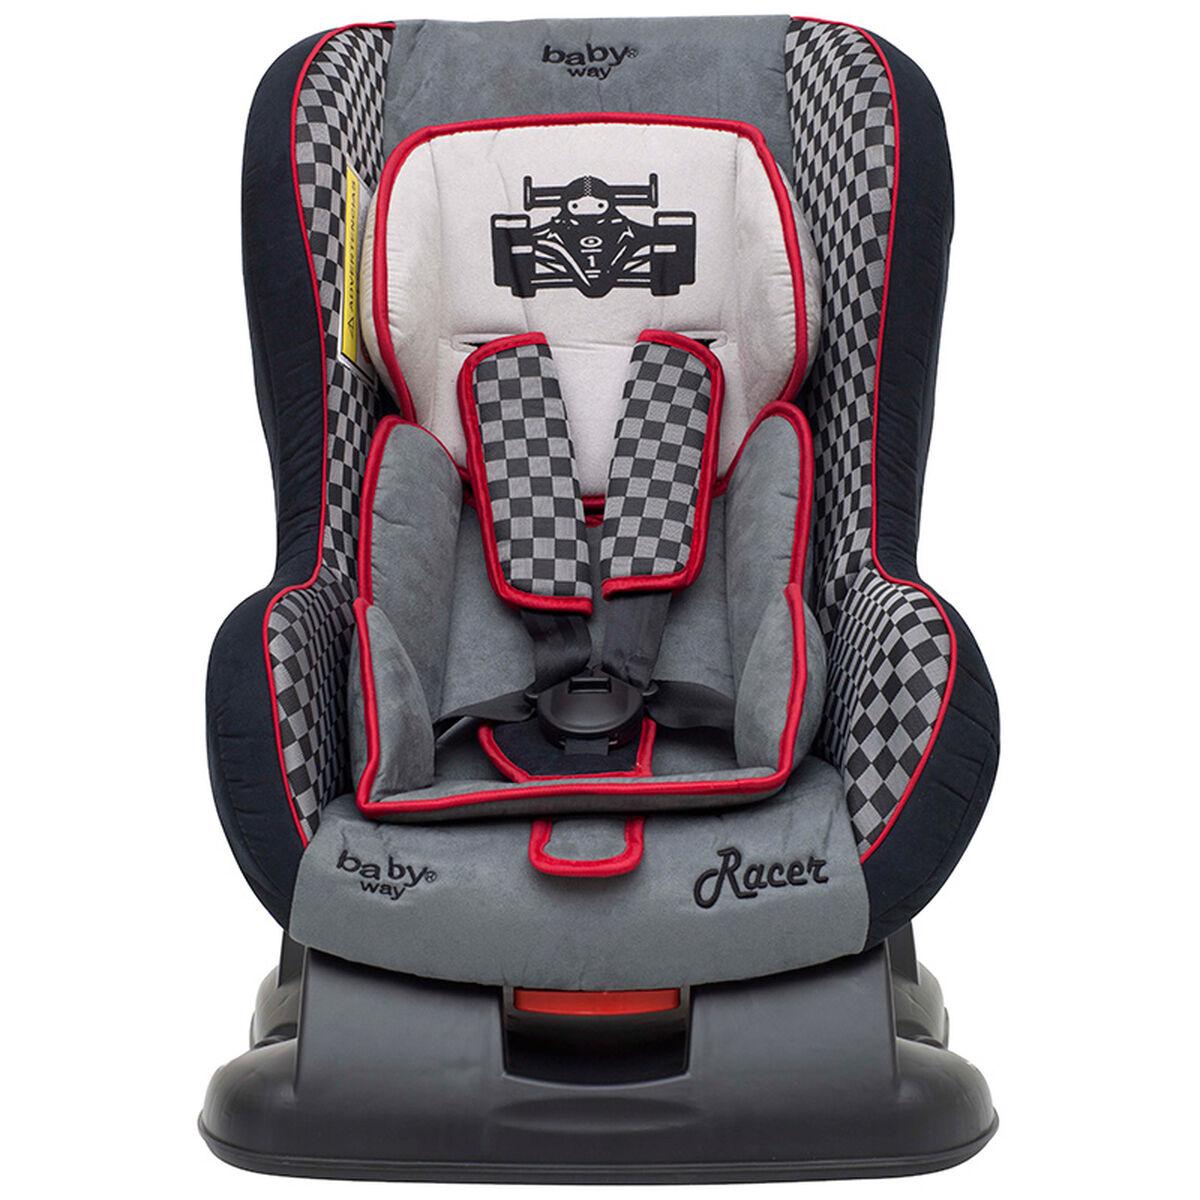 Silla para Auto Baby WayBW 743